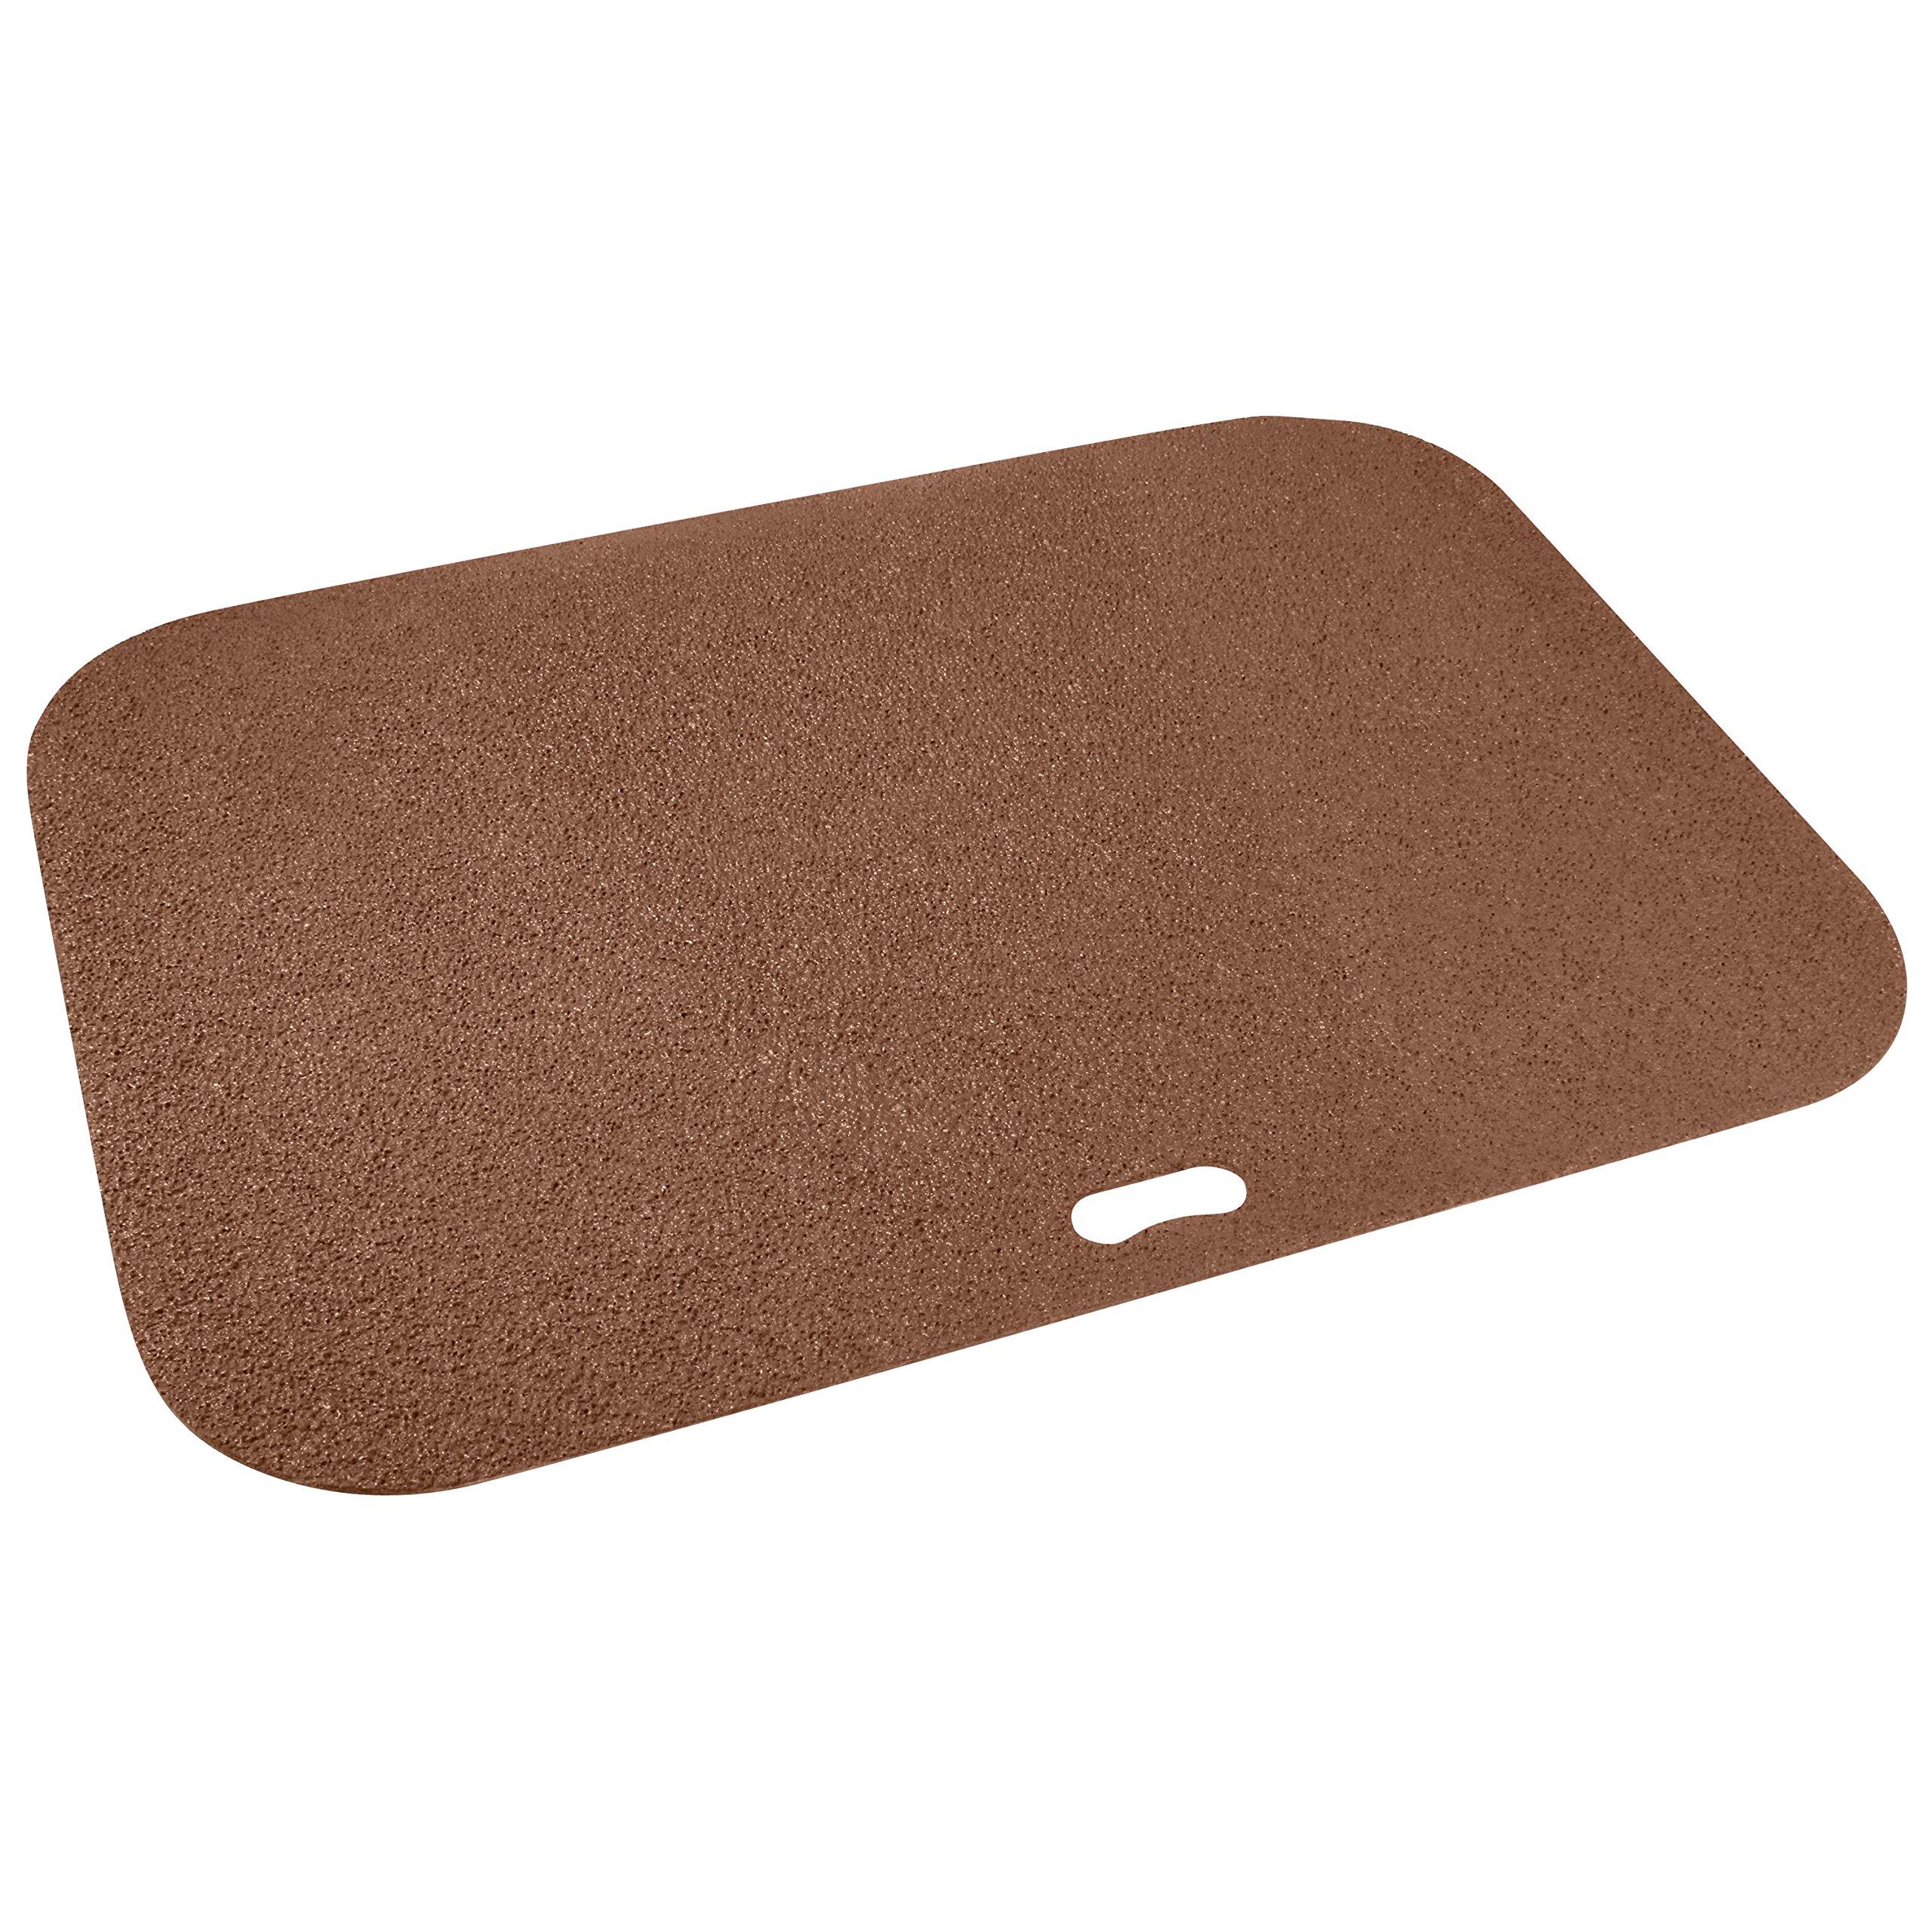 Diversitech Original Grill Mat - BBQ Floor Mat - Put Under Gas Grill, Fryer, Fire Pit - Protects Decks and Patios - 30 x 42 Inches - Rectangle - Brown